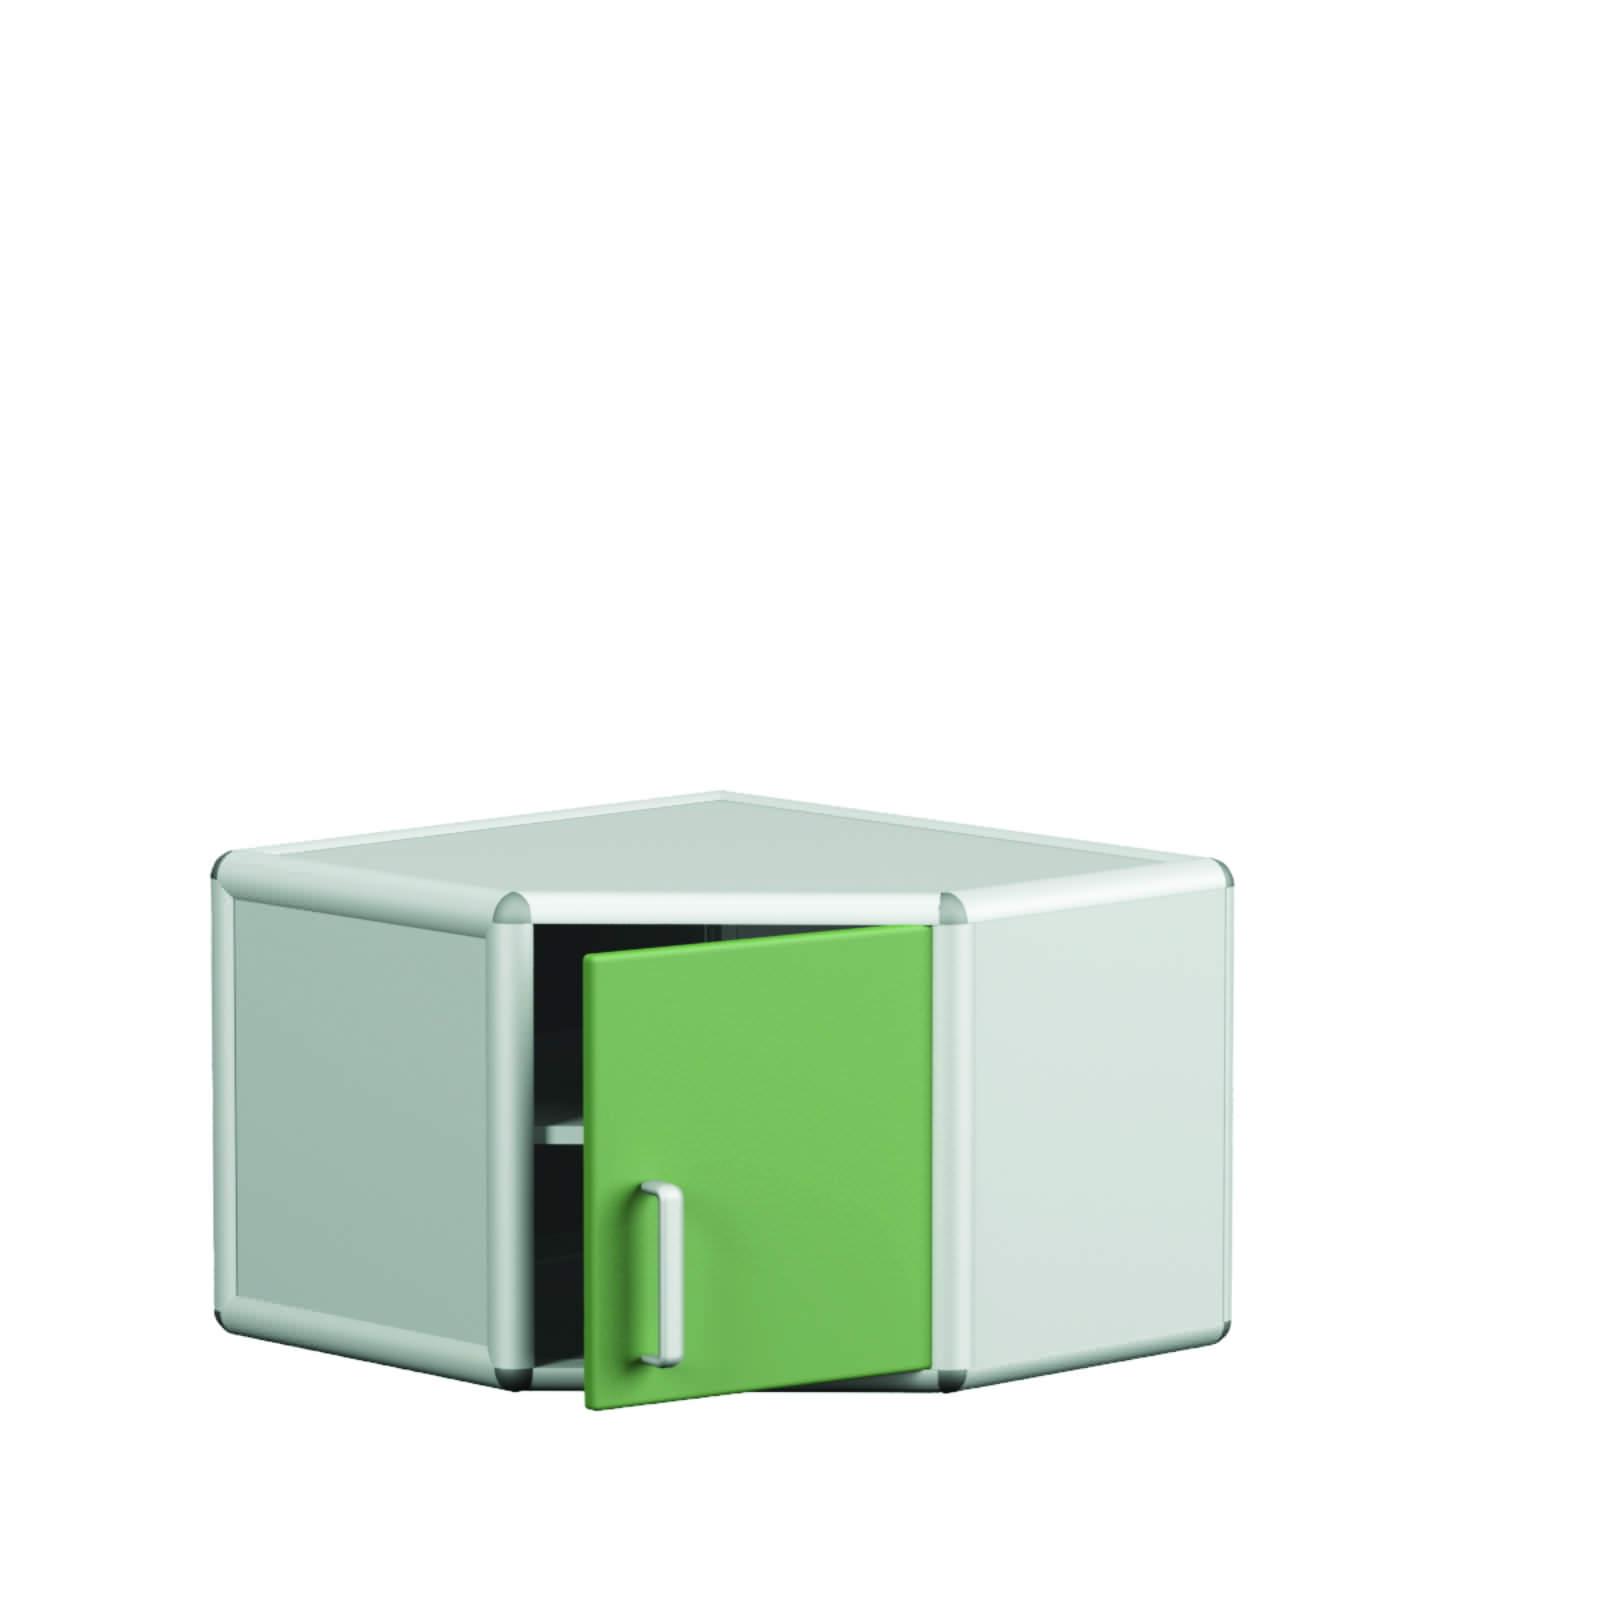 Шкаф навесной ДМ-1-002-06